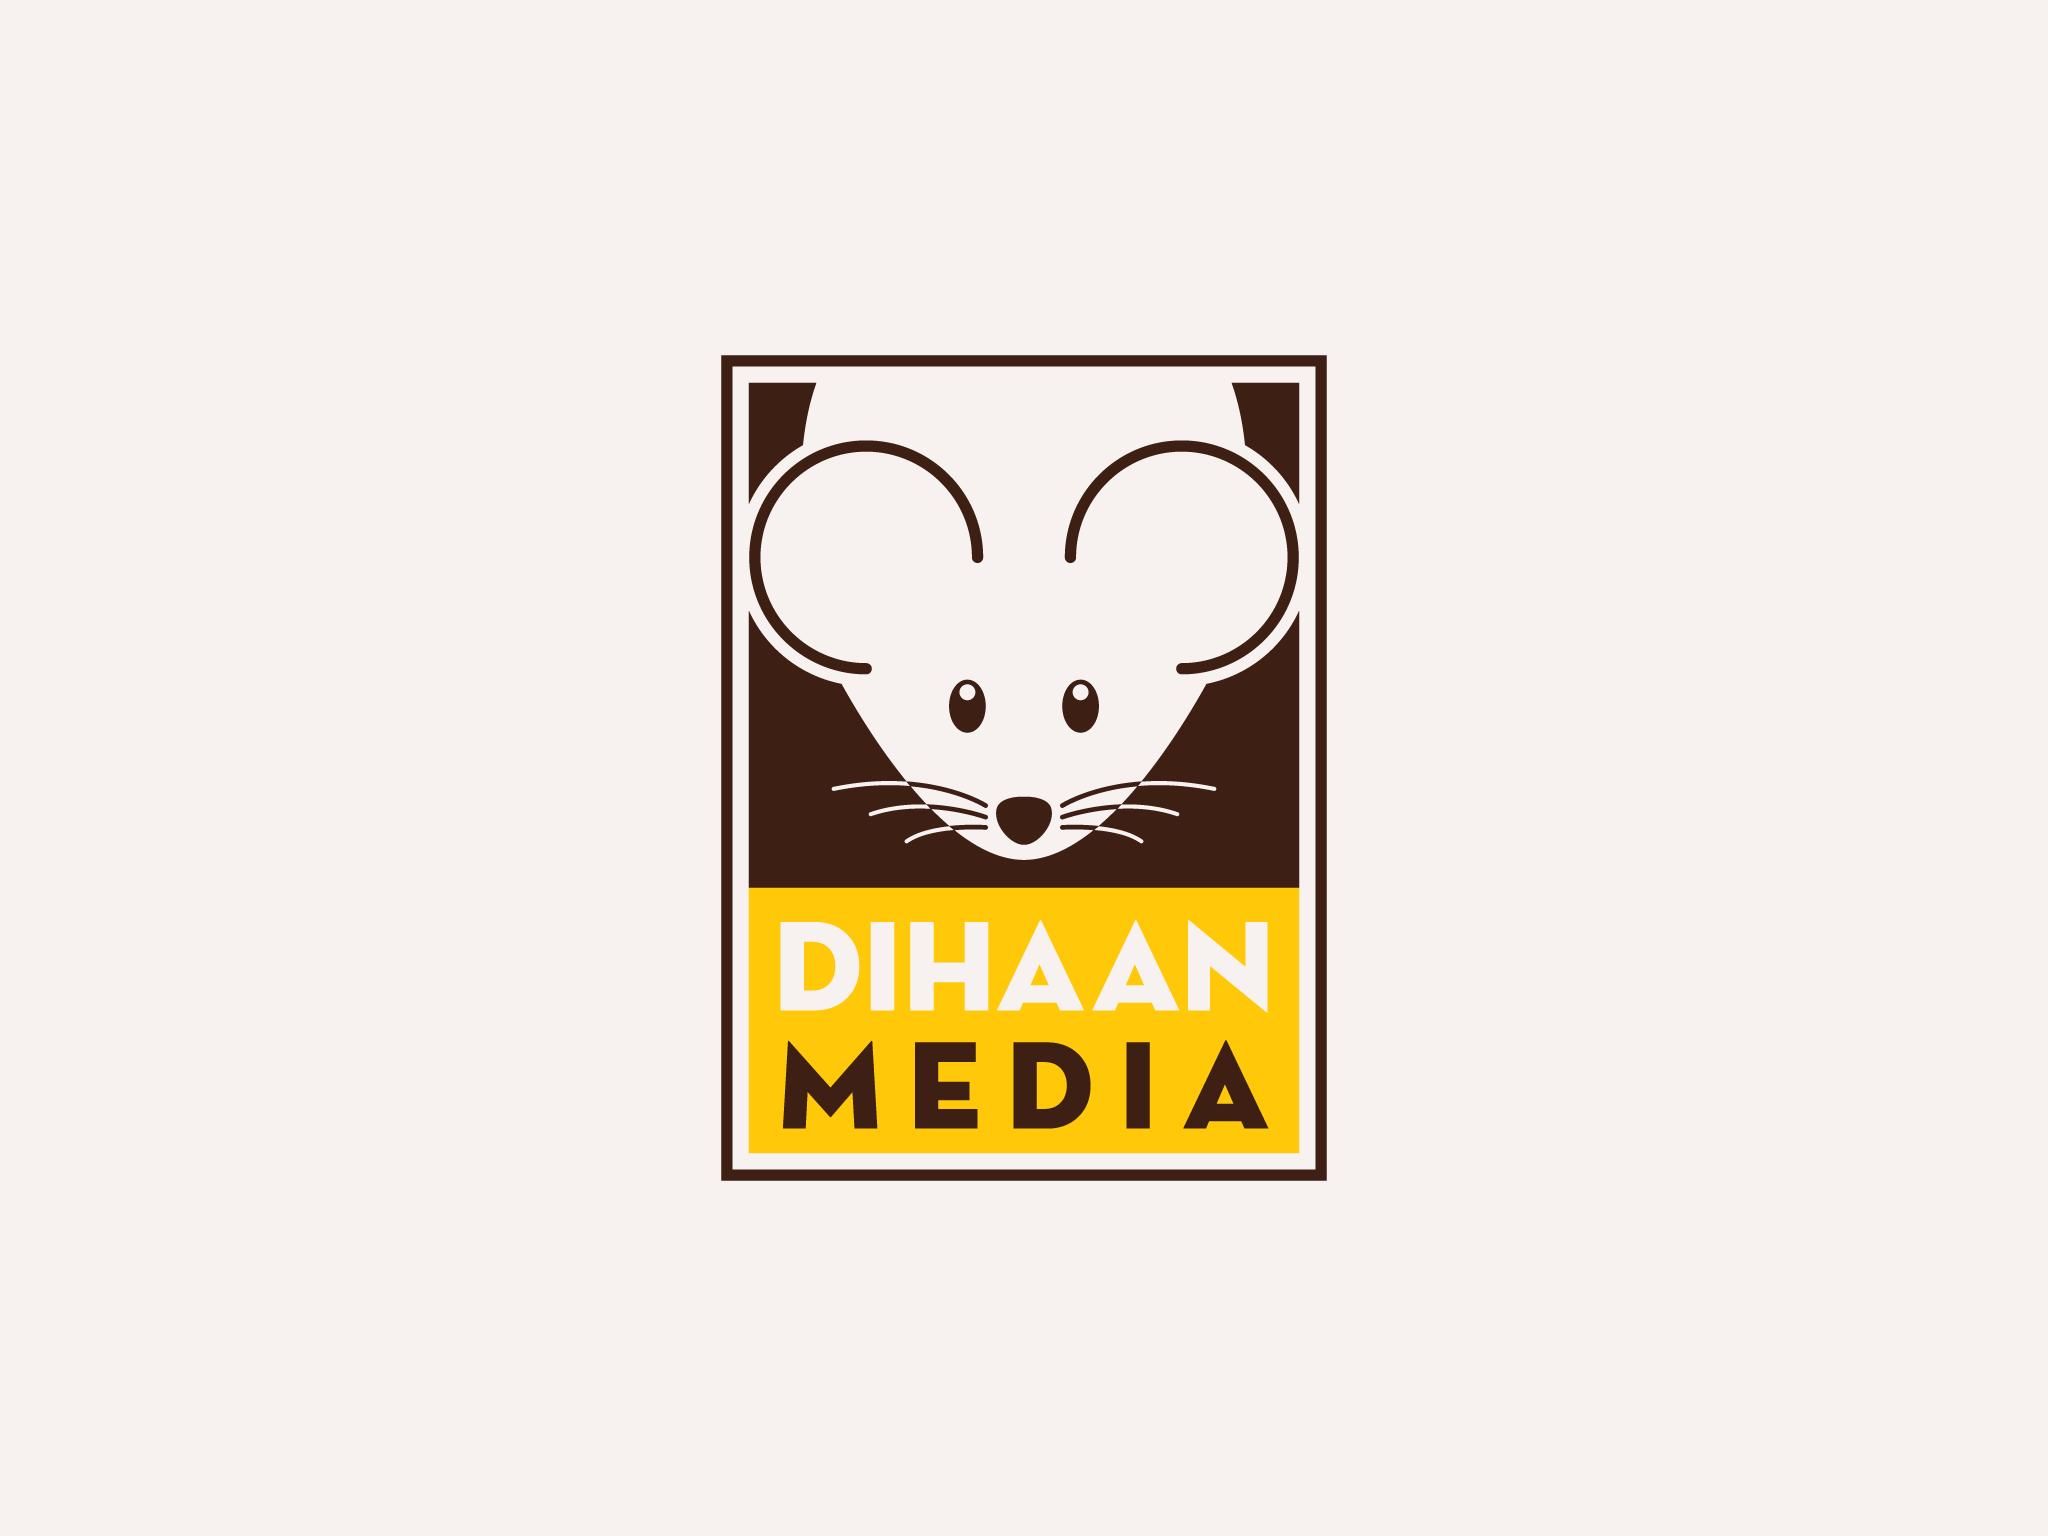 Logo Dihaan Media